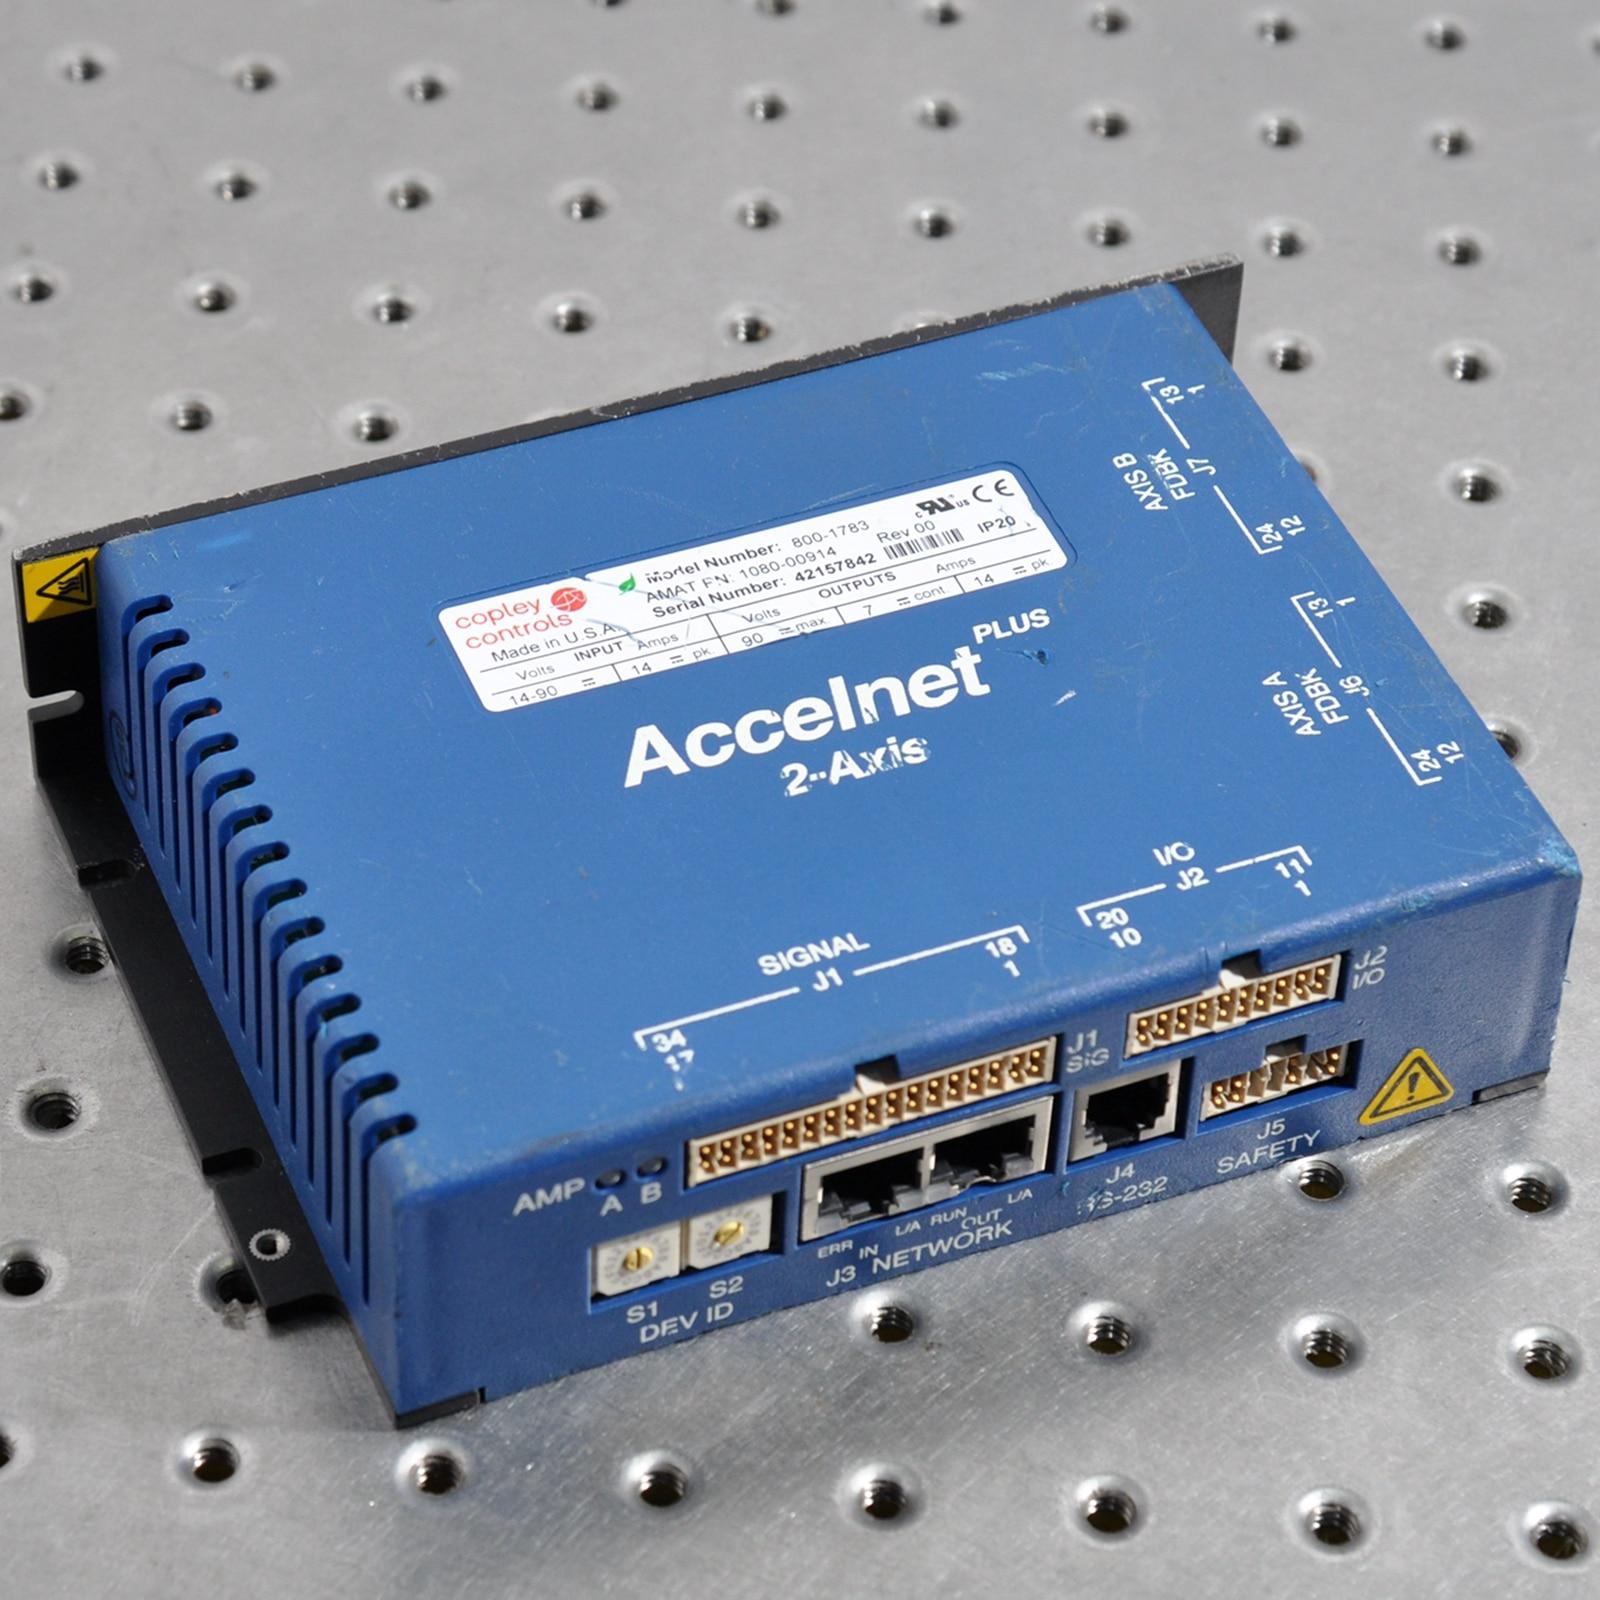 US copley controls CORP 800-1783 drive